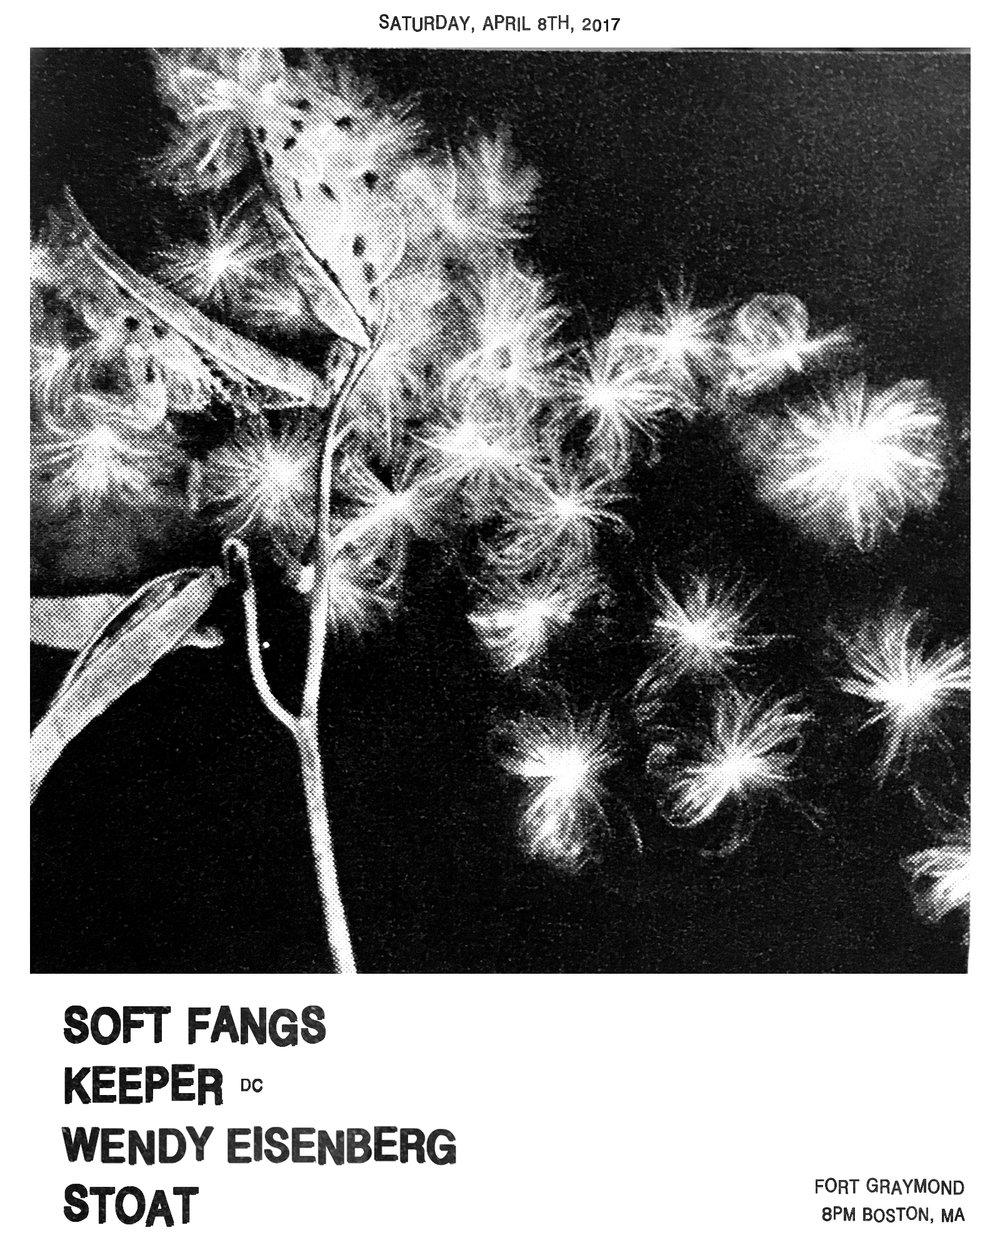 Flyer-SoftFangs48-UpdatedWendy copy.JPG